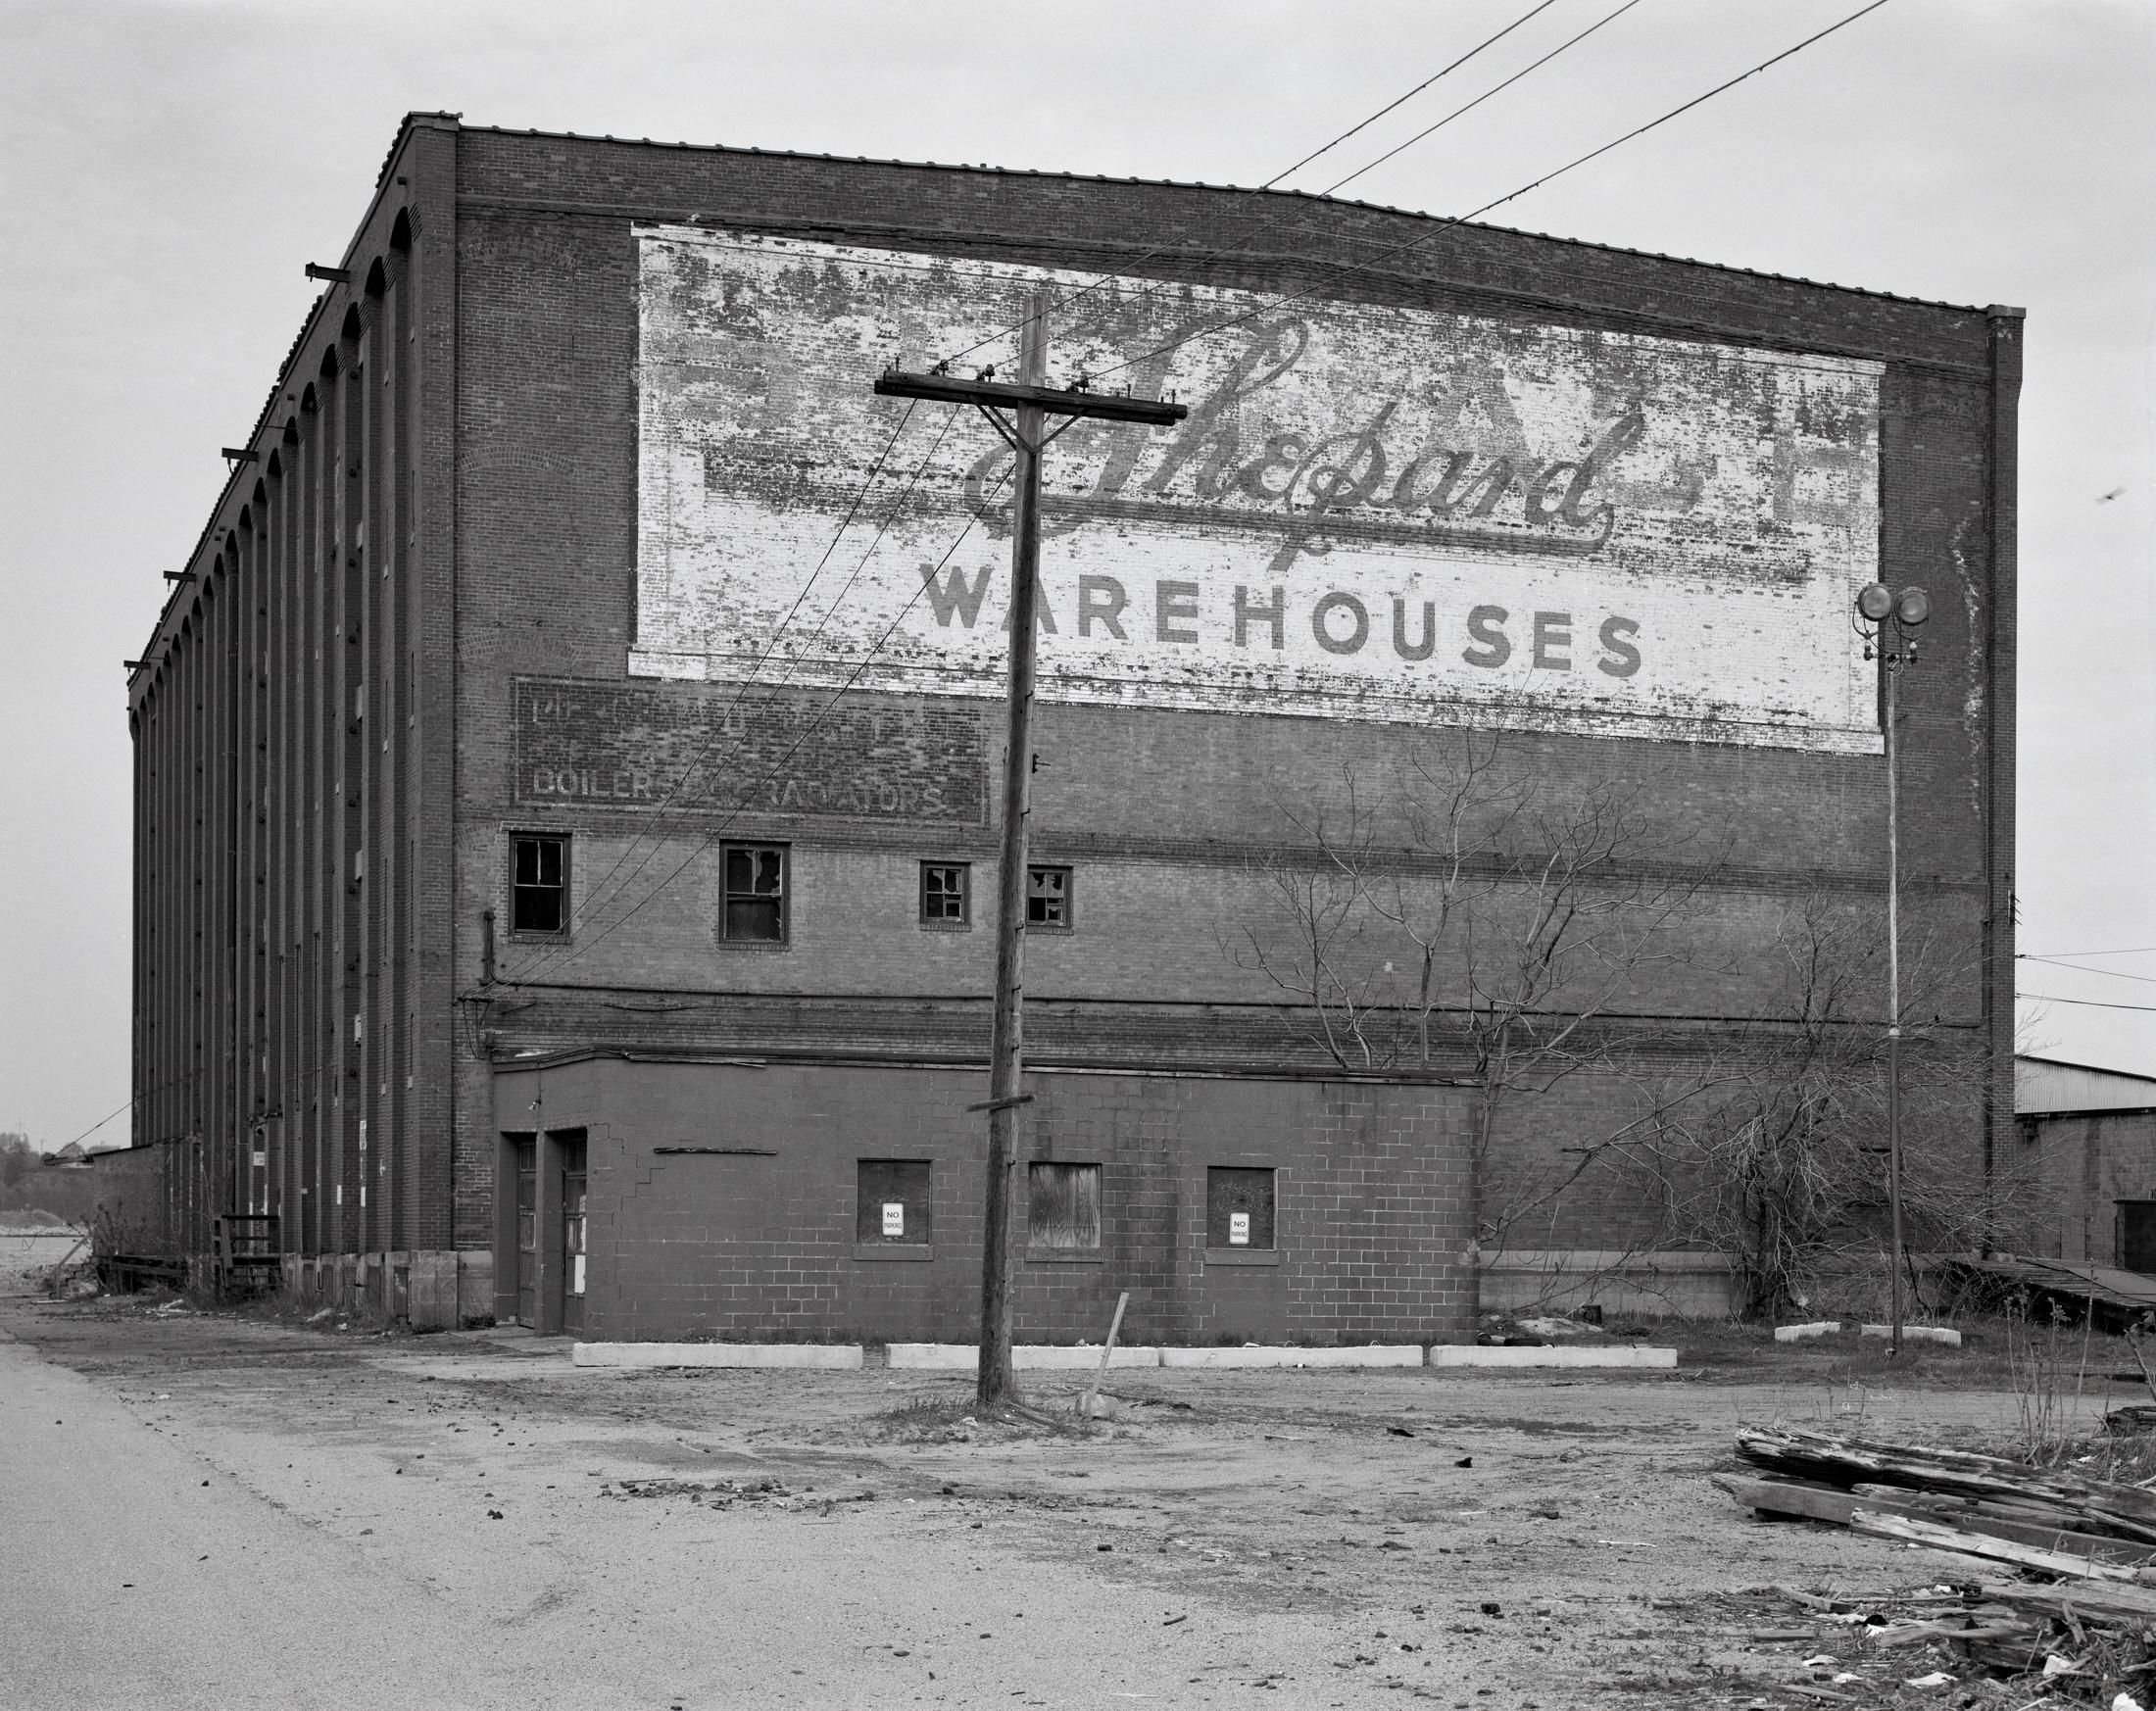 1992_45_Tri-X _shepards warehouse 001